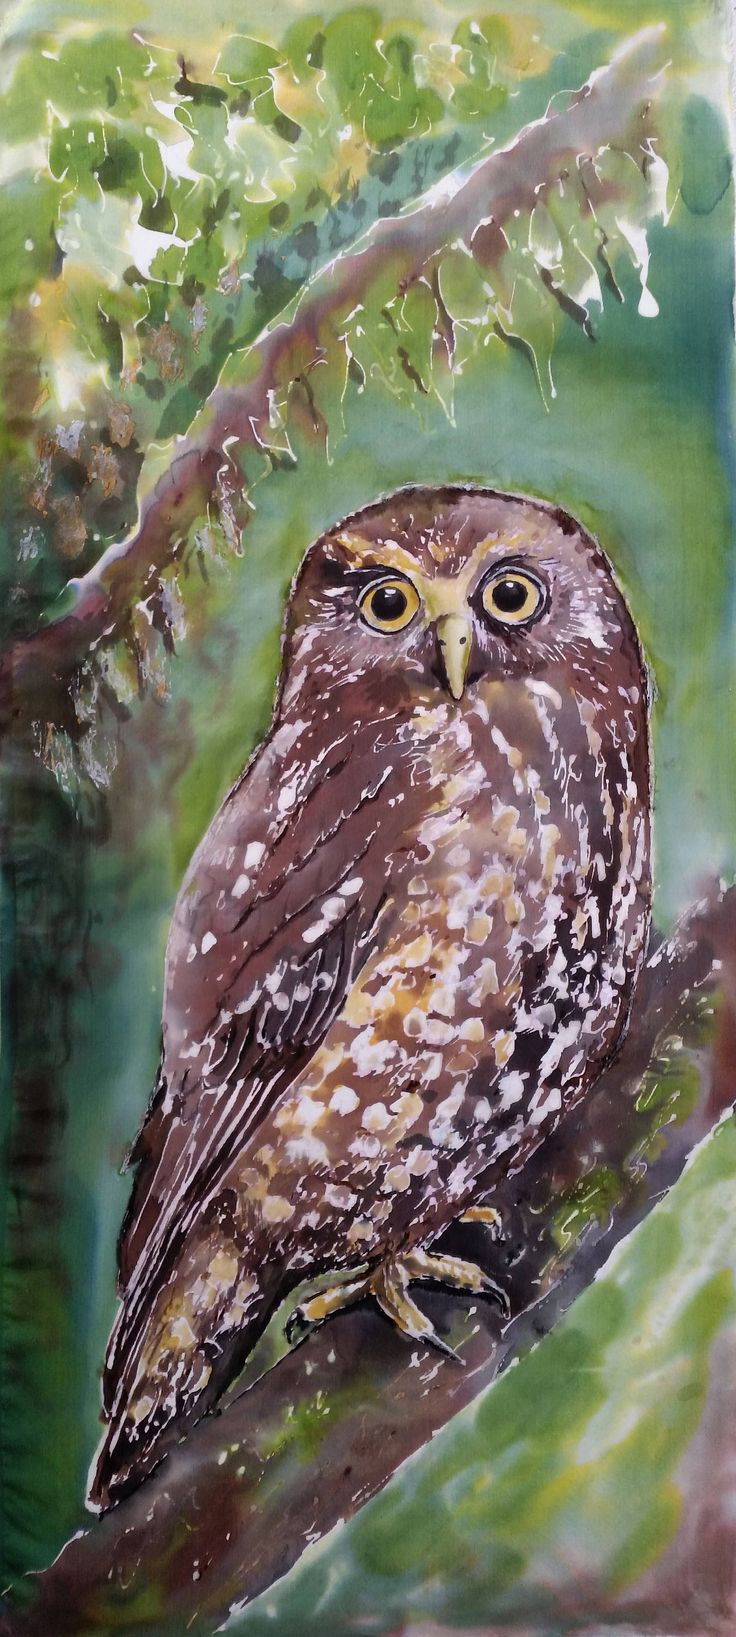 Owl OUTDOOR ART, New Zealand native OWL, Ruru, Morpork, from my original silk painting, Outside Garden Art, New Zealand native Owl bird, by KaySatherleyArt on Etsy